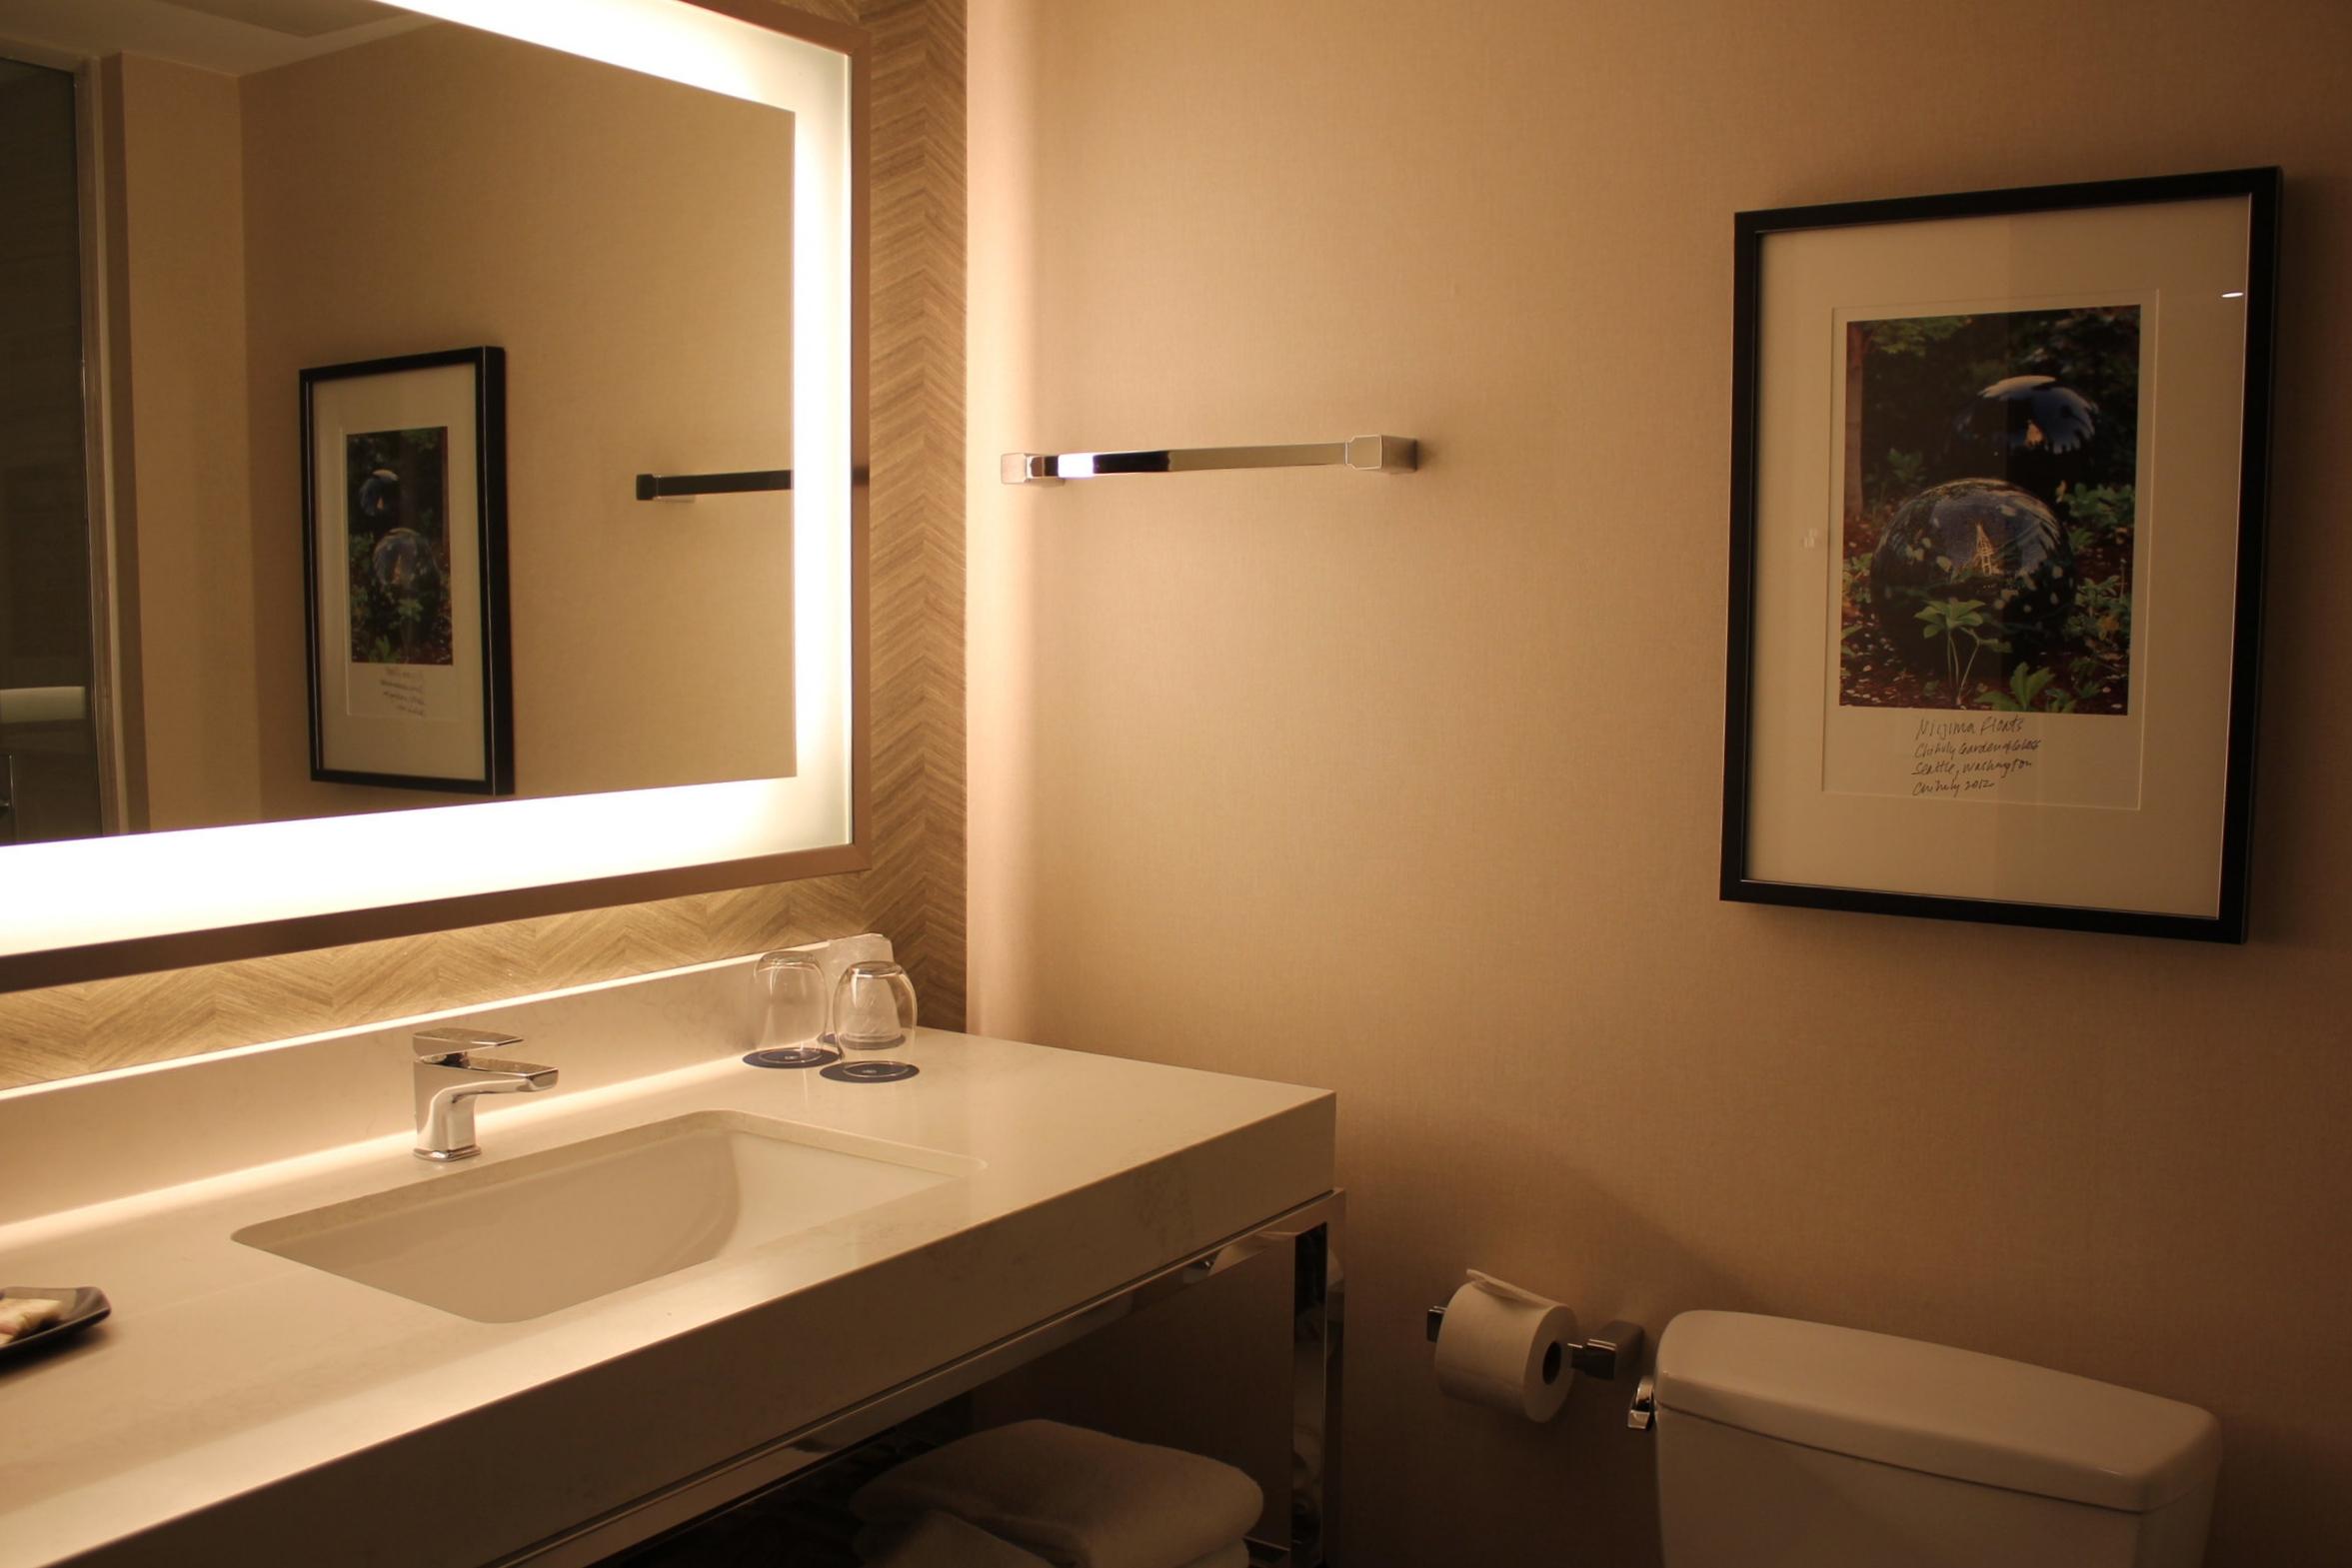 Sheraton Seattle – Bathroom